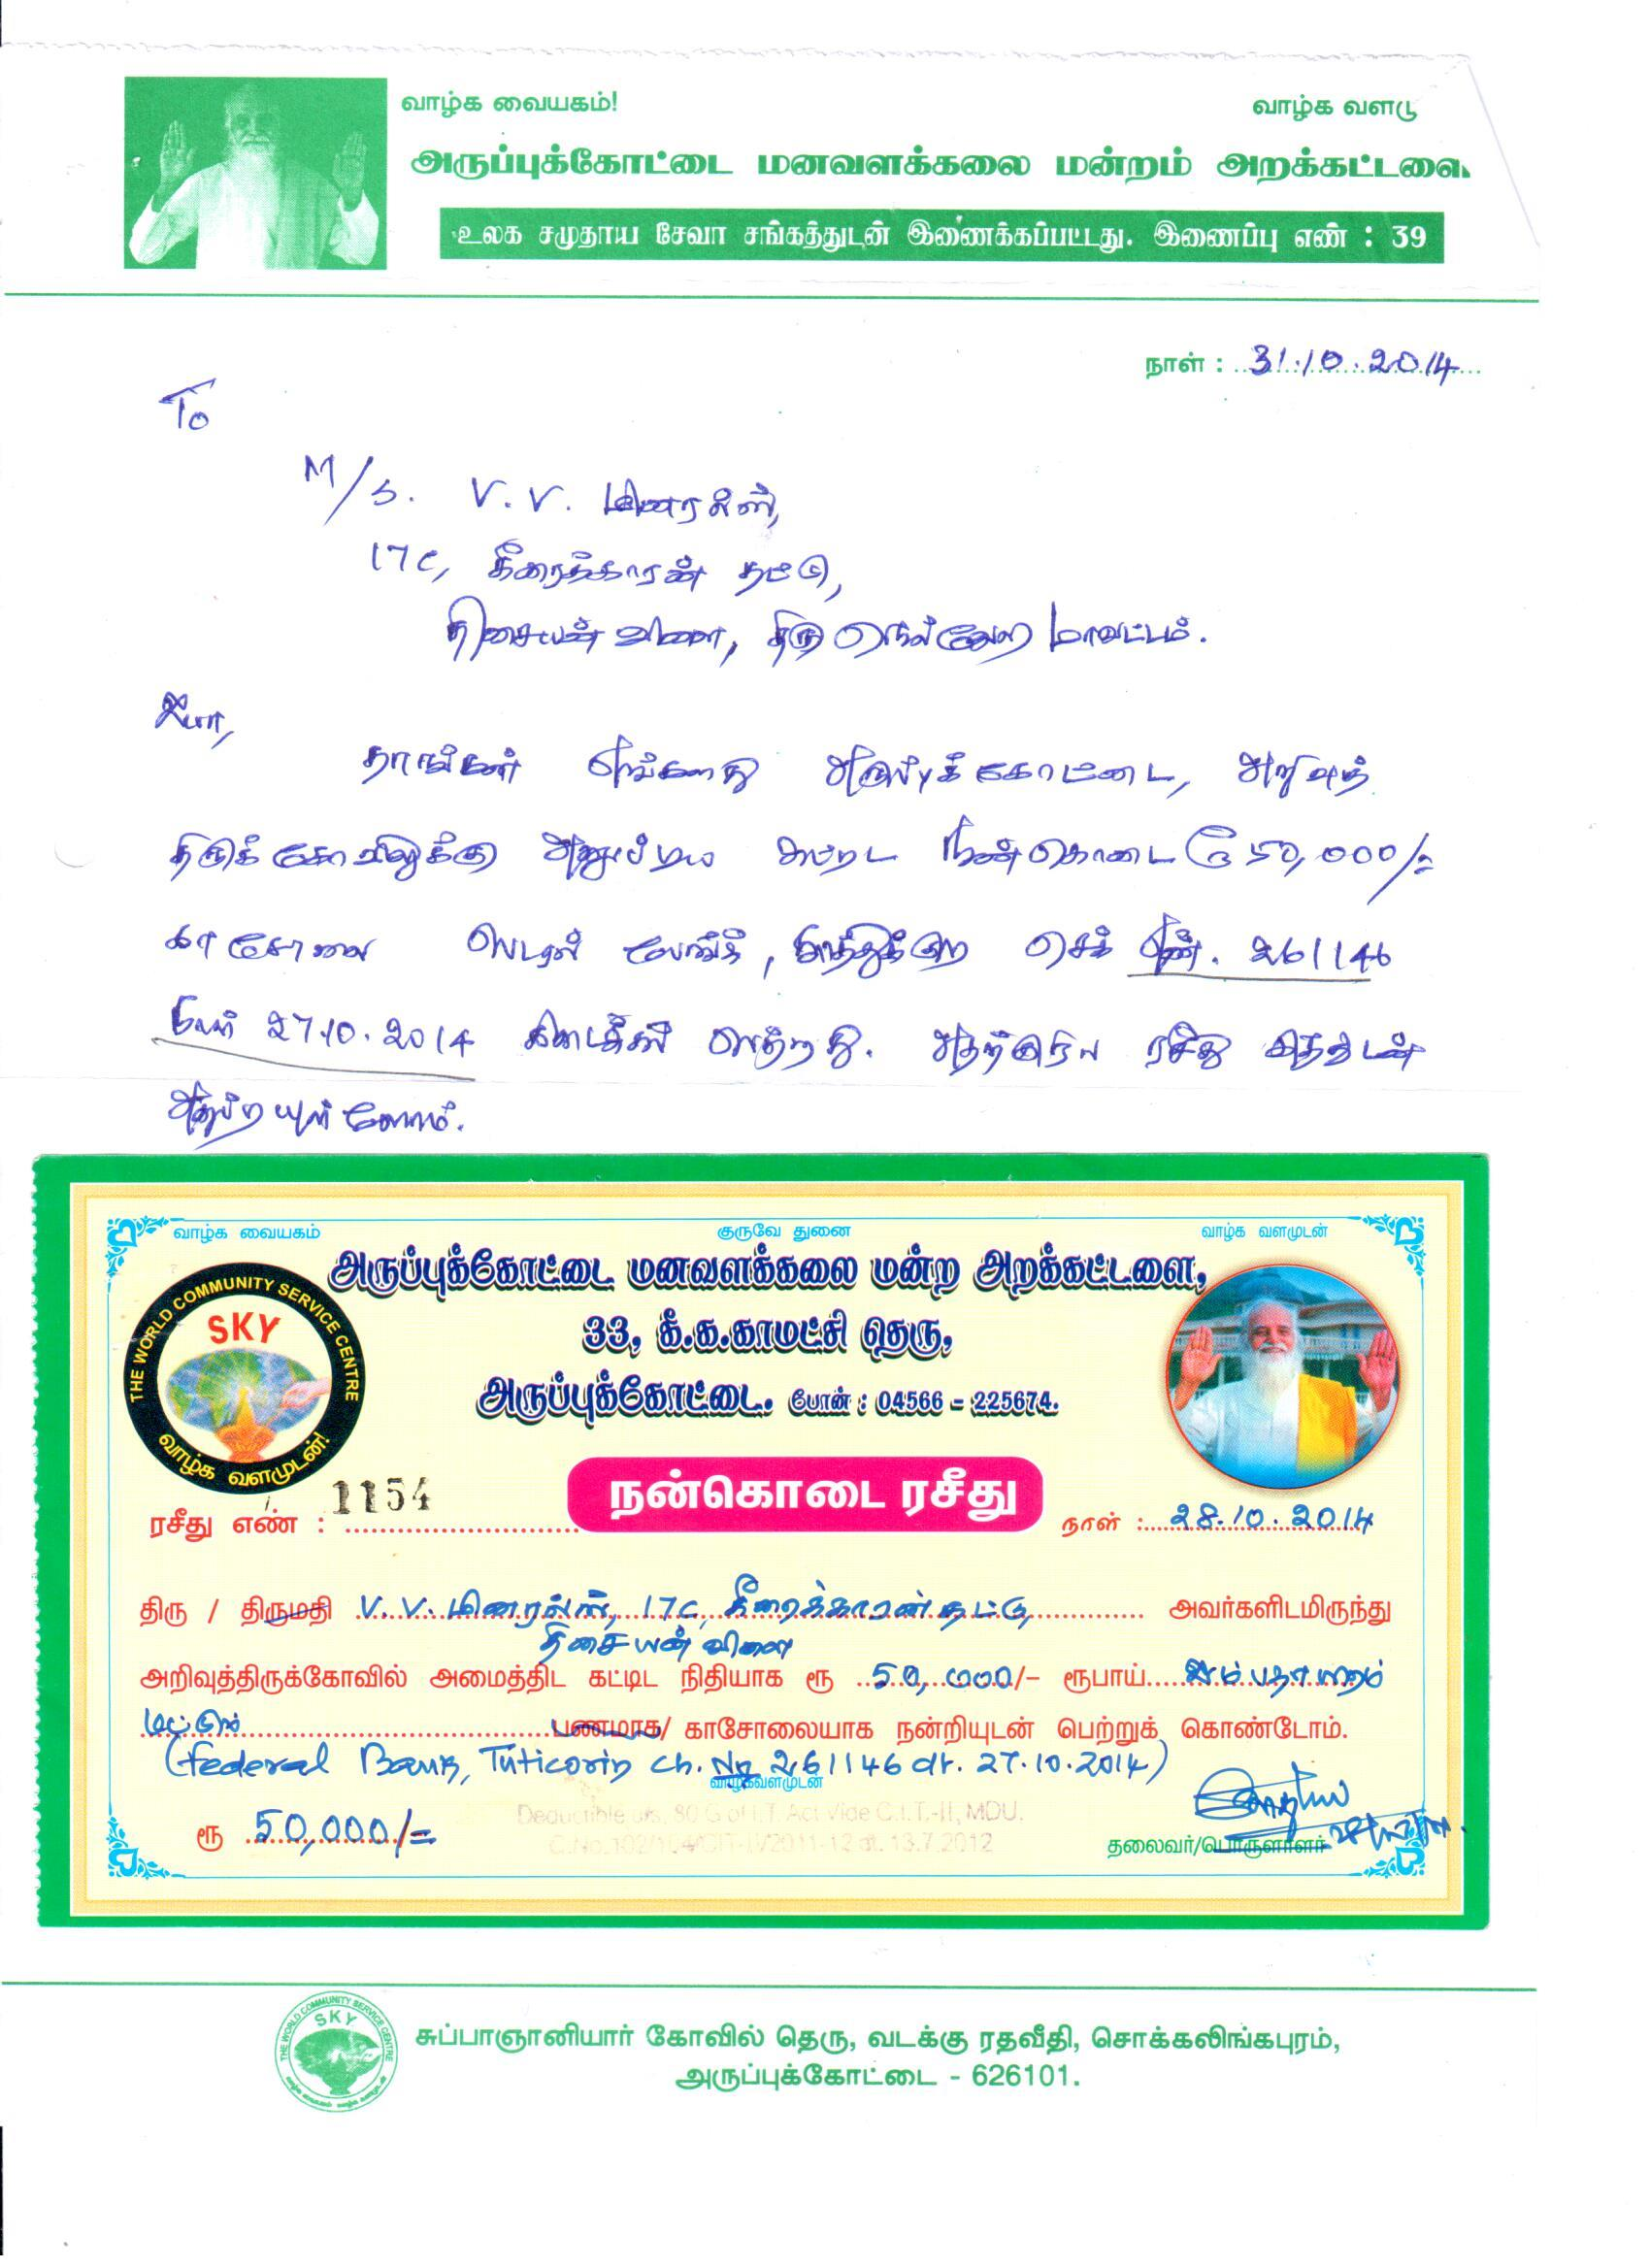 Aruppukottai Manavala kalai mandram Donation Receipt 31.10.14